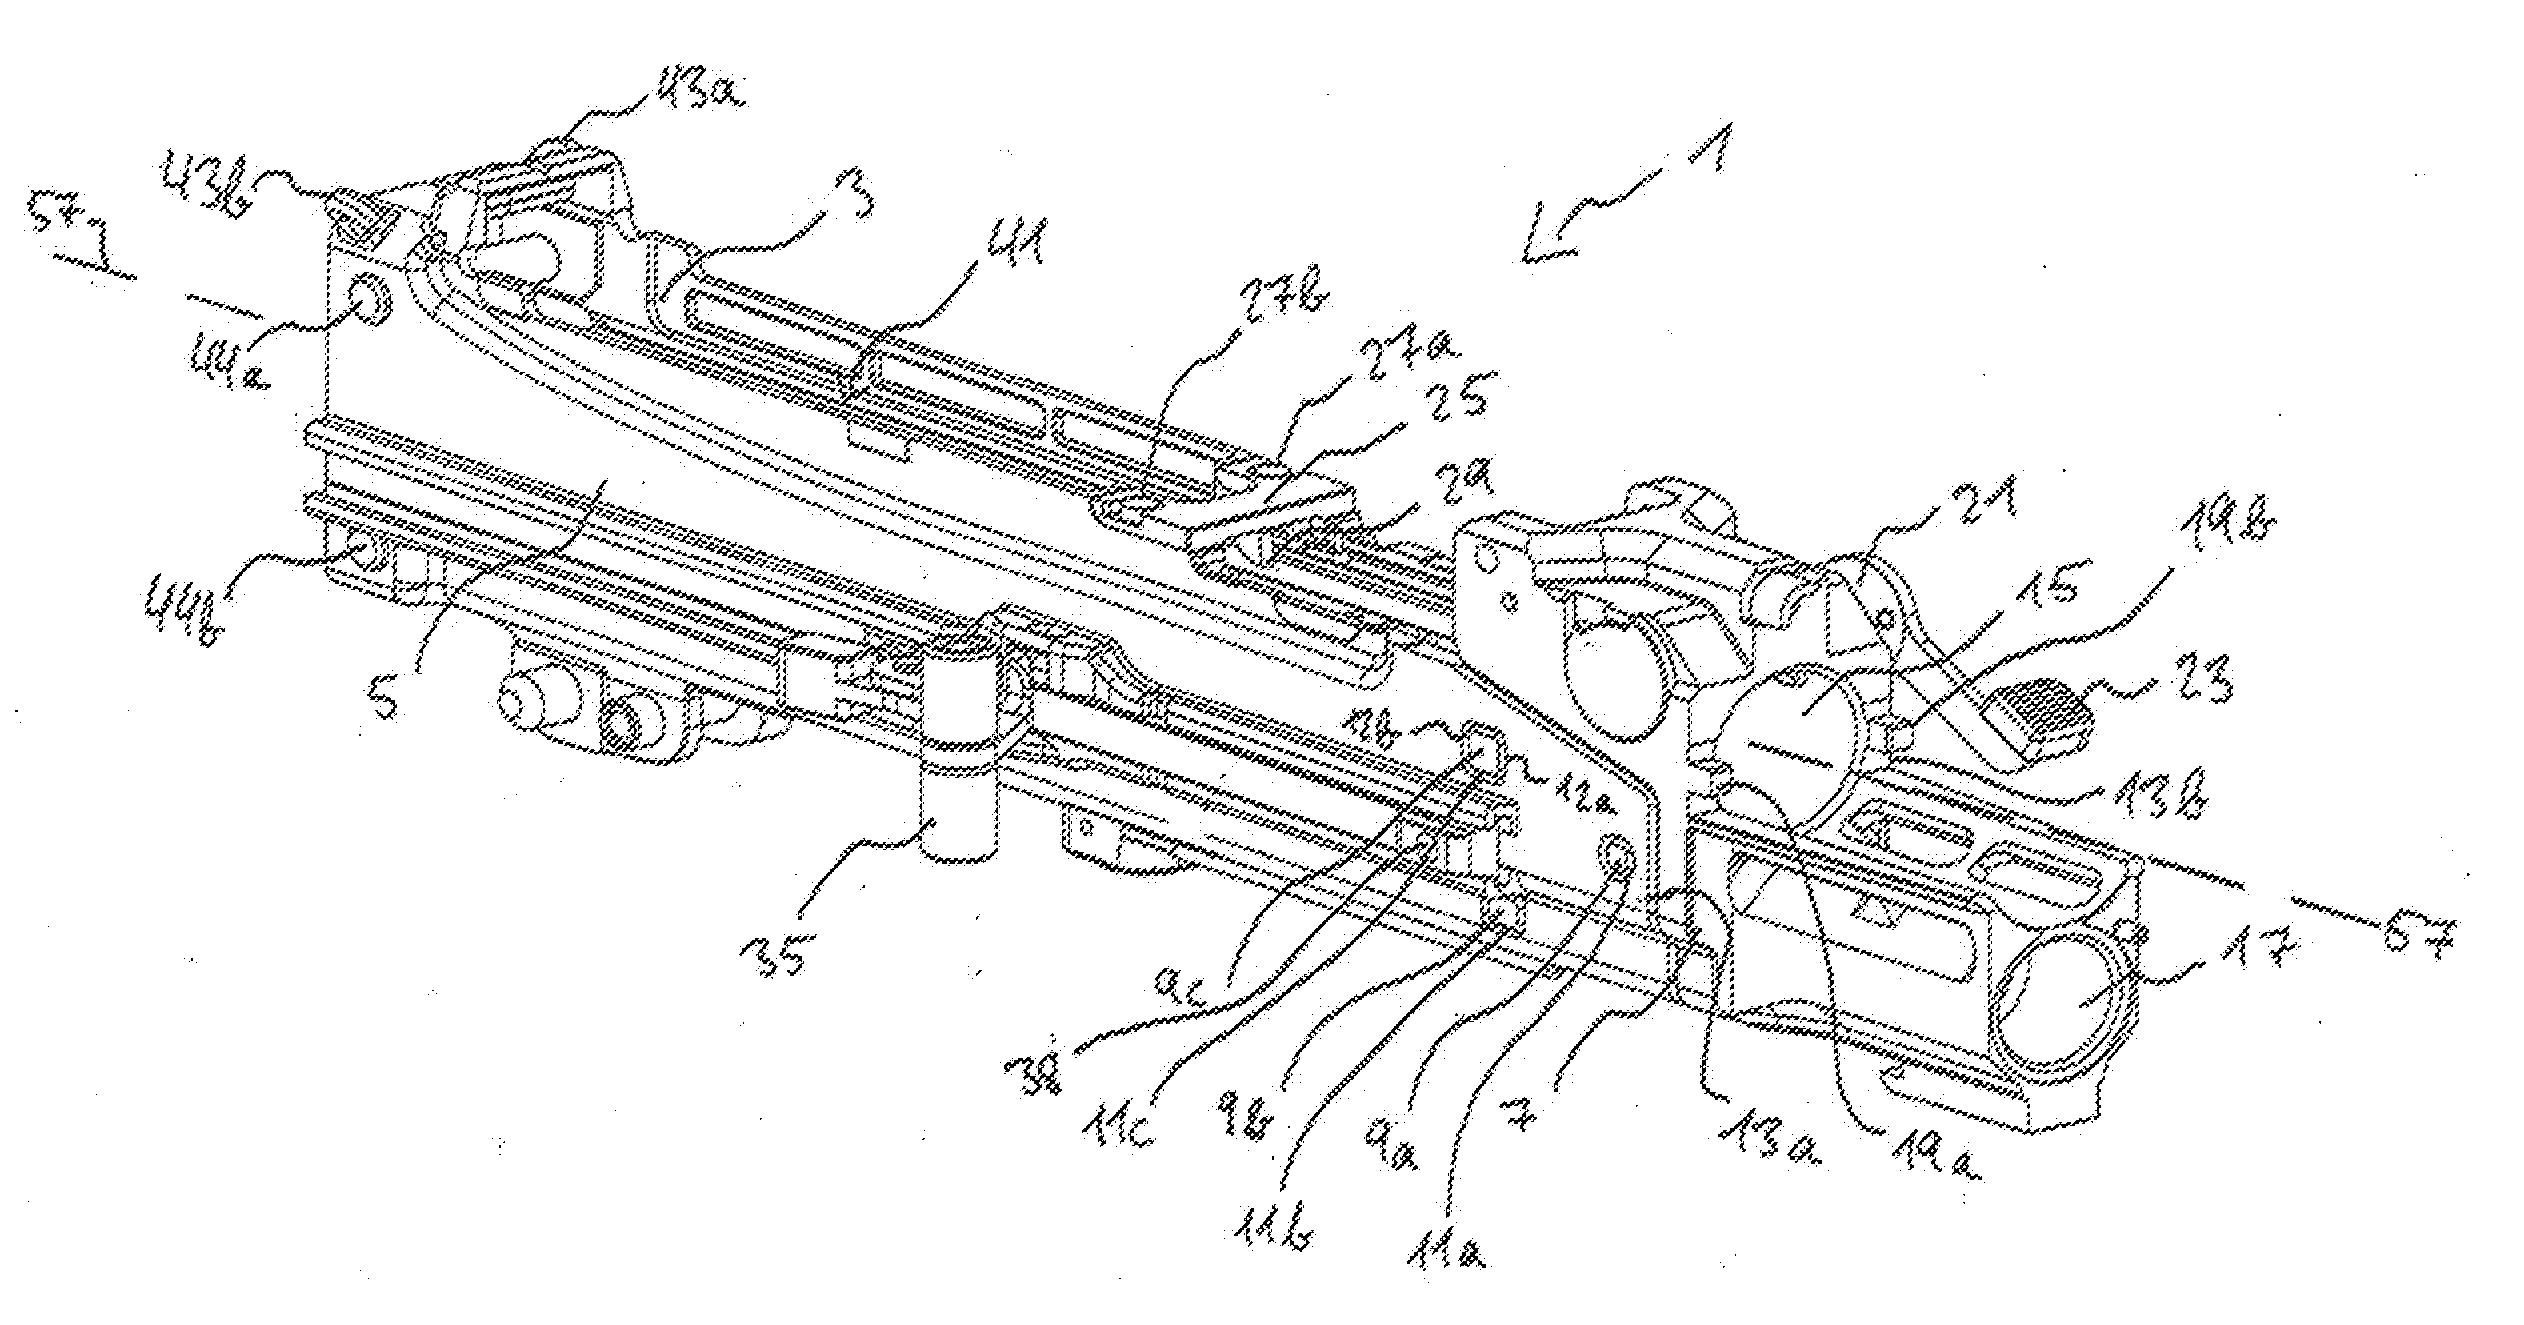 Mg42 Schematic